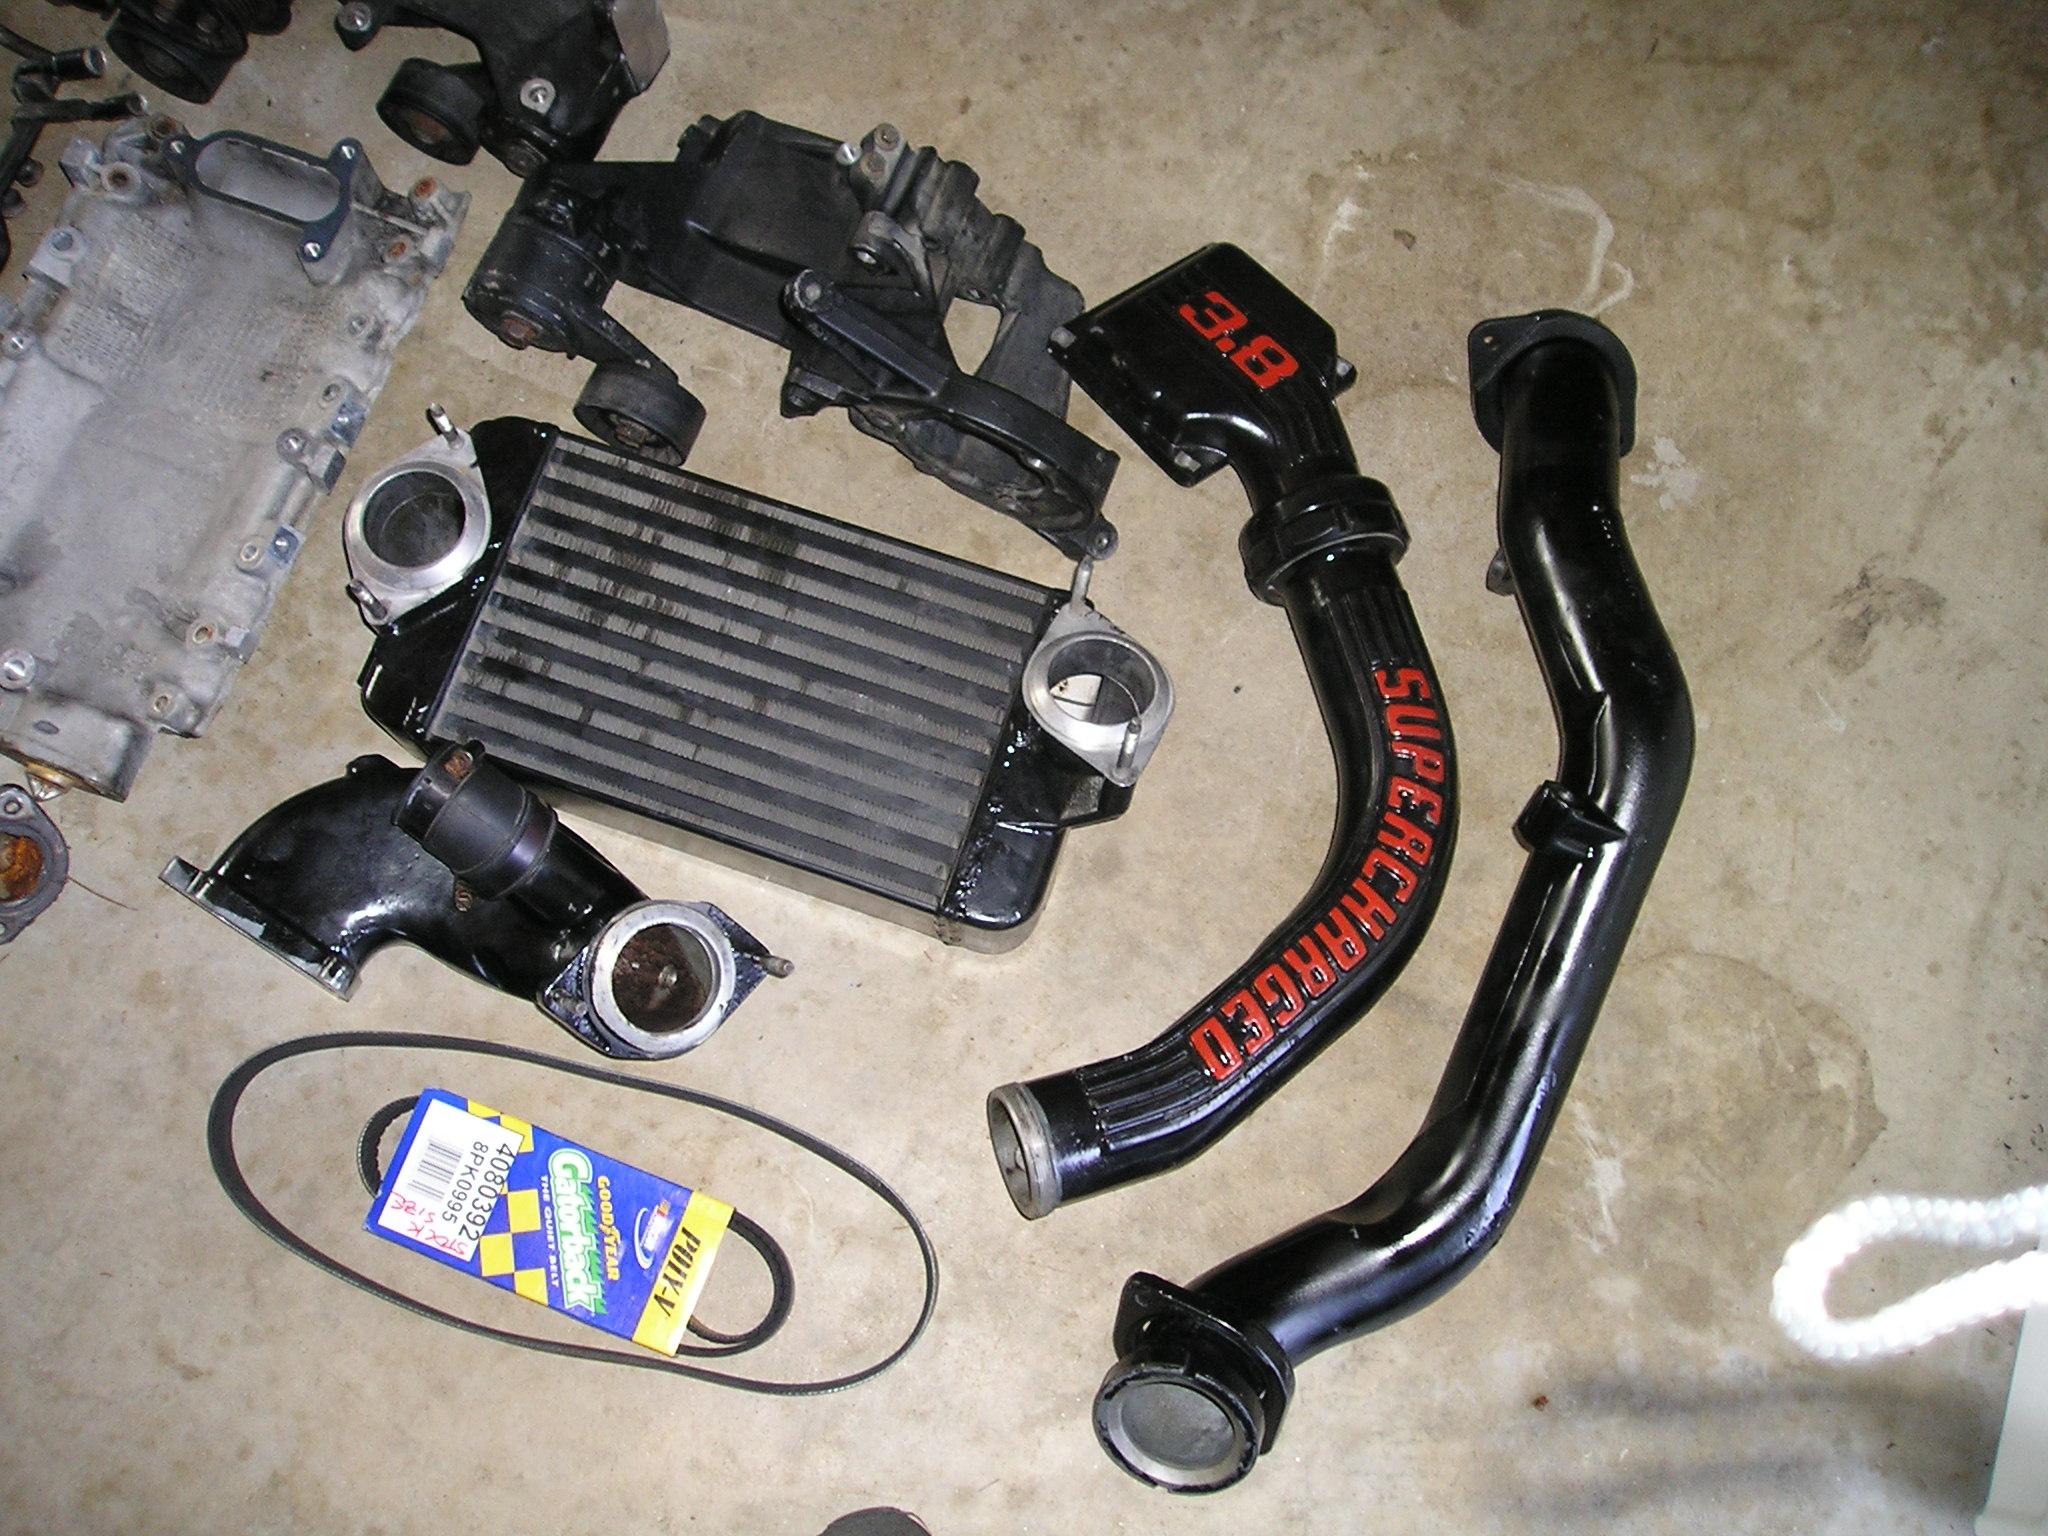 Eaton M90 Supercharger for V6 Mustangs - Mustang Evolution